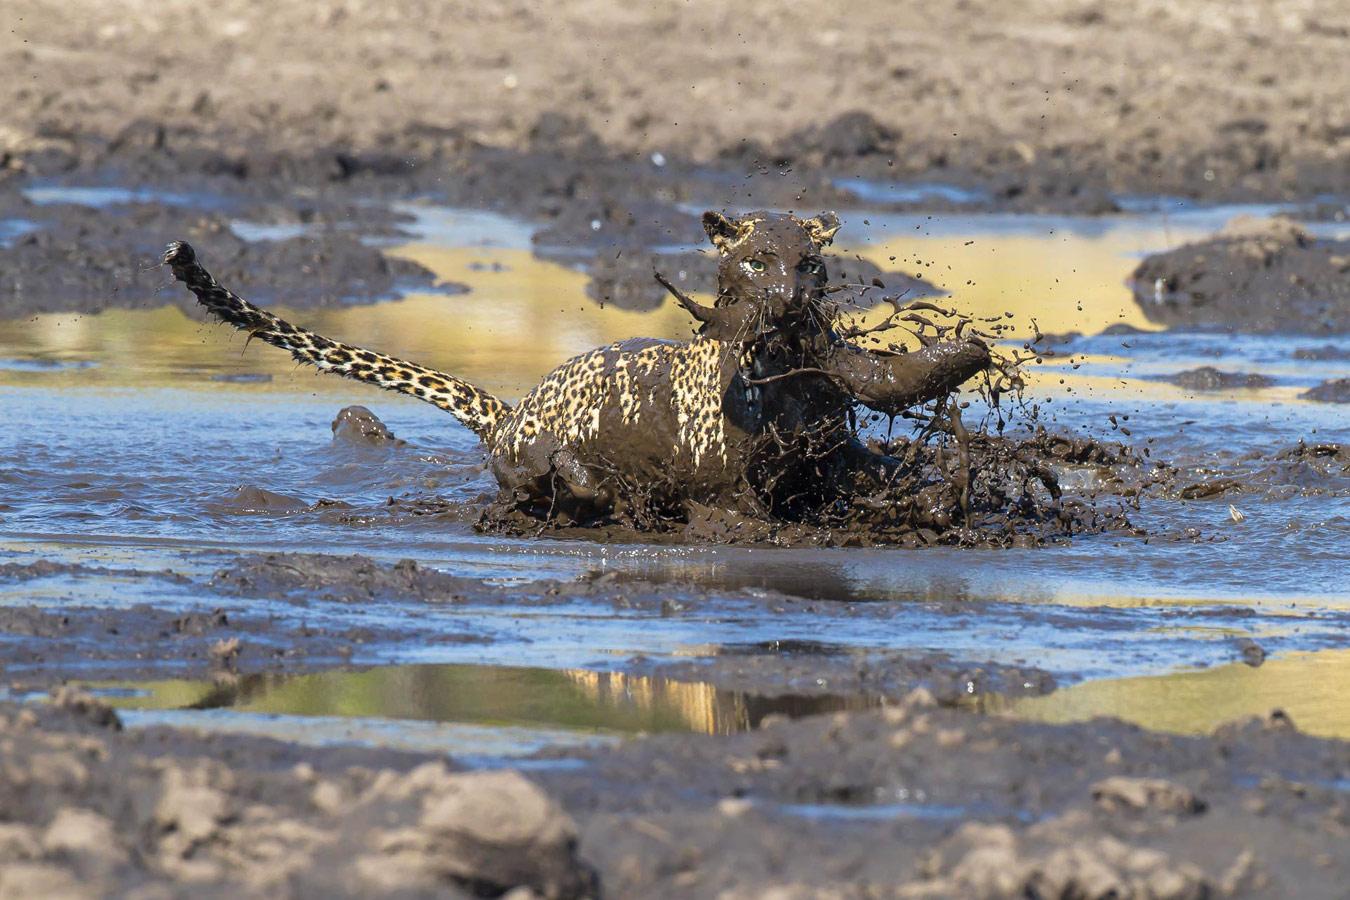 © Джеймс Гиффорд / James Gifford, Победитель премии журнала «Oasis», Фотоконкурс Oasis Photo Contest